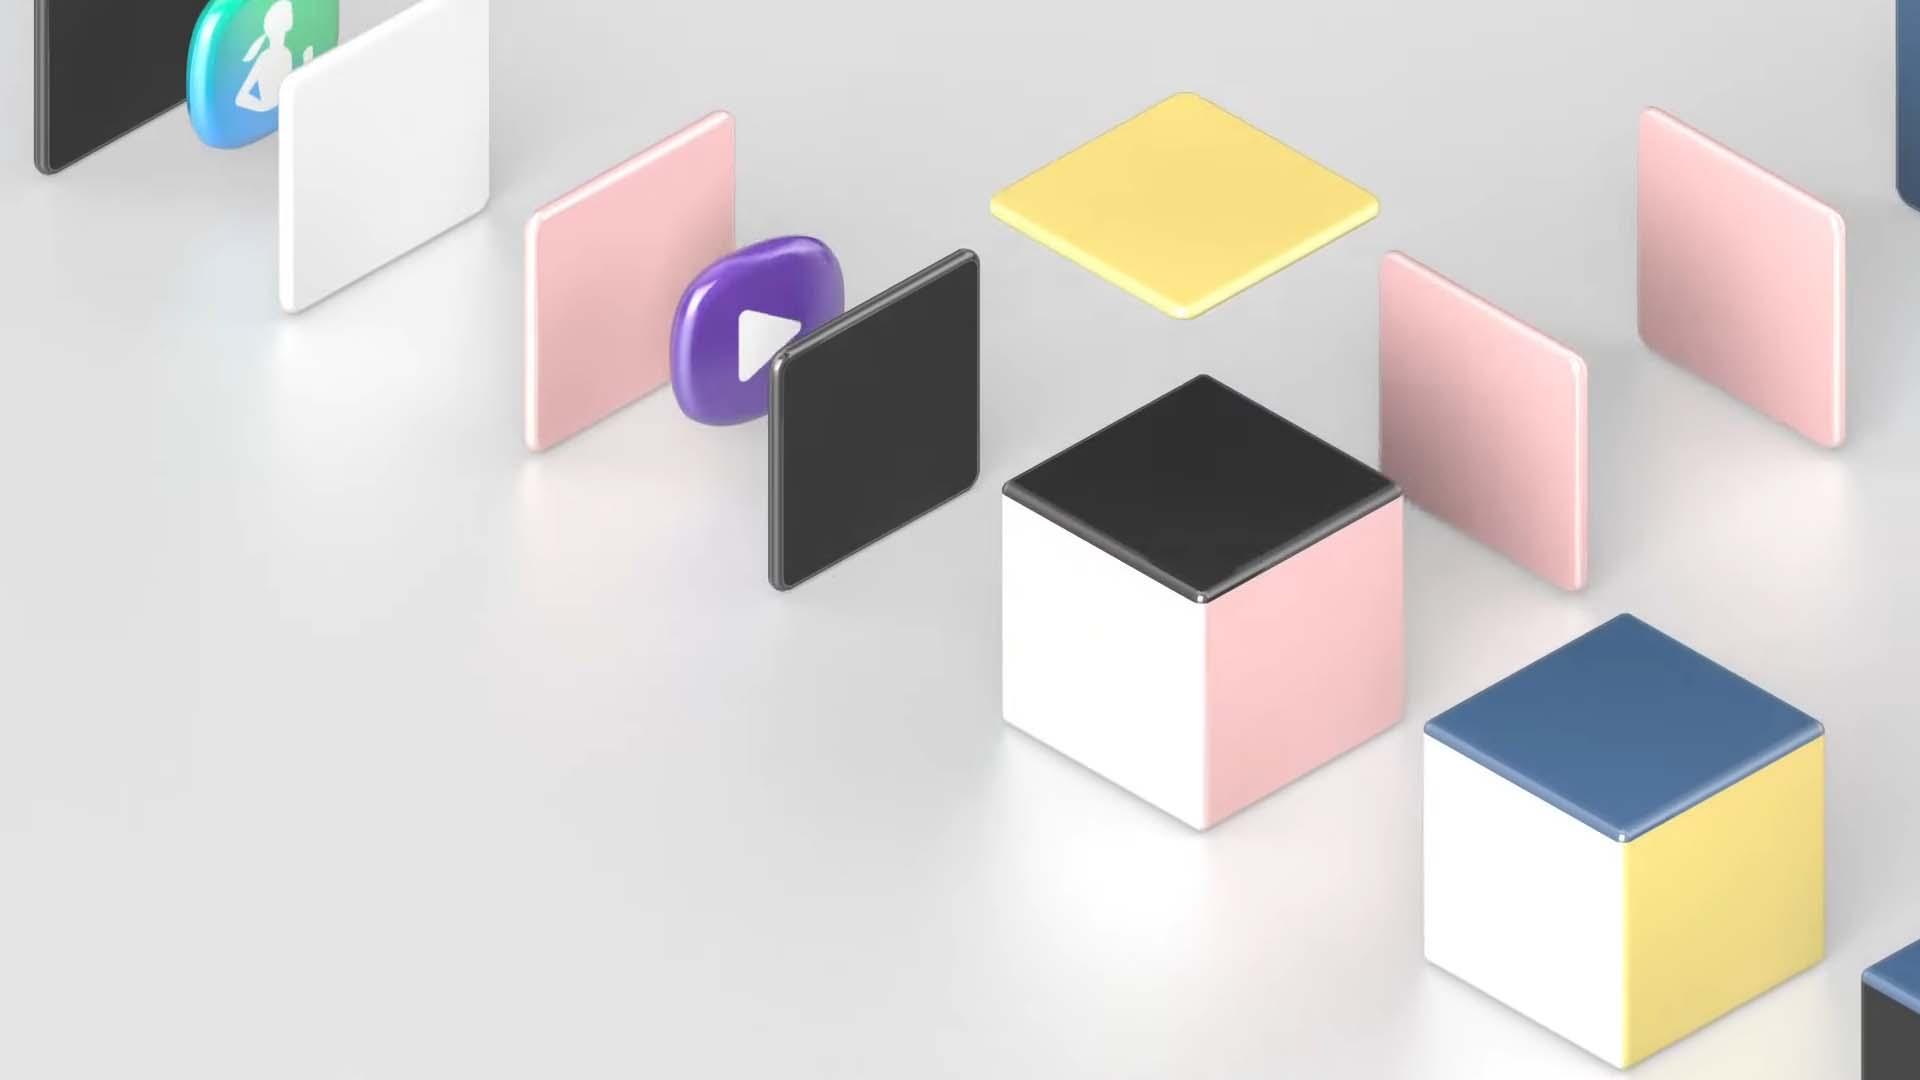 Samsung Galaxy Unpacked Part 2: Έρχεται στις 20 Οκτωβρίου